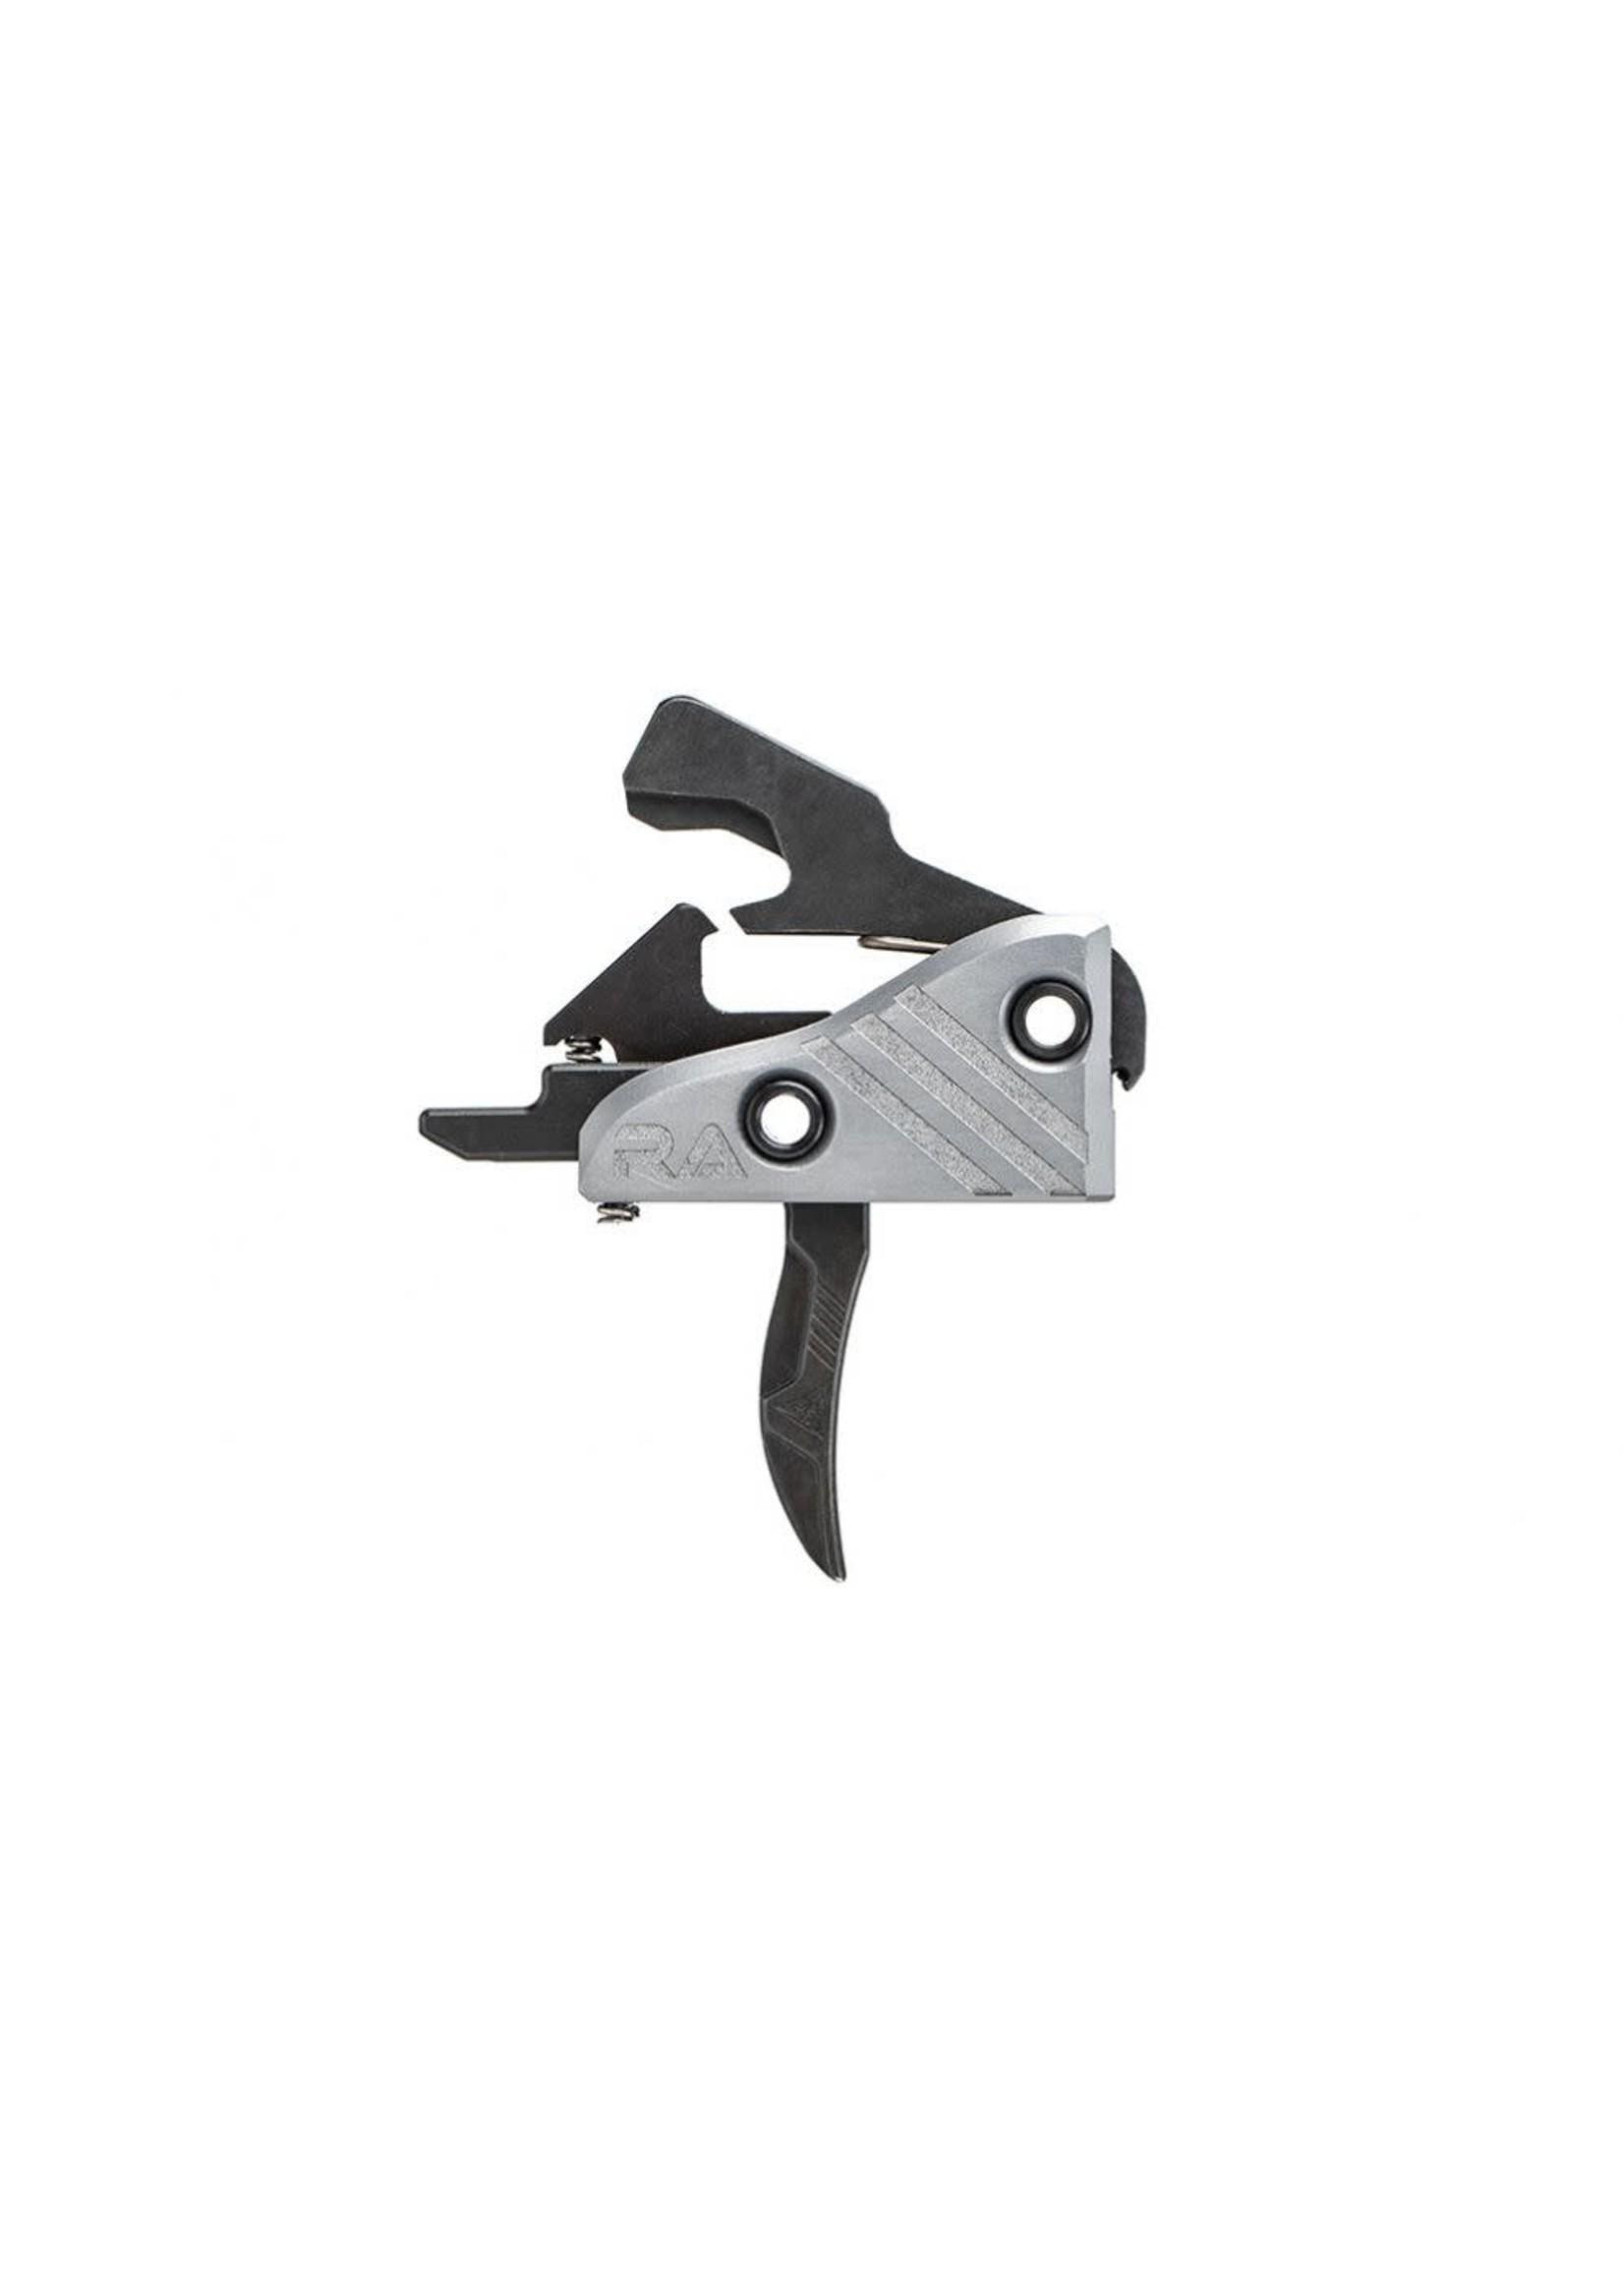 Rise Armament Rise Armament BLITZ Elite Performance Trigger - Curved Bow w/ Anti-Walk Pins